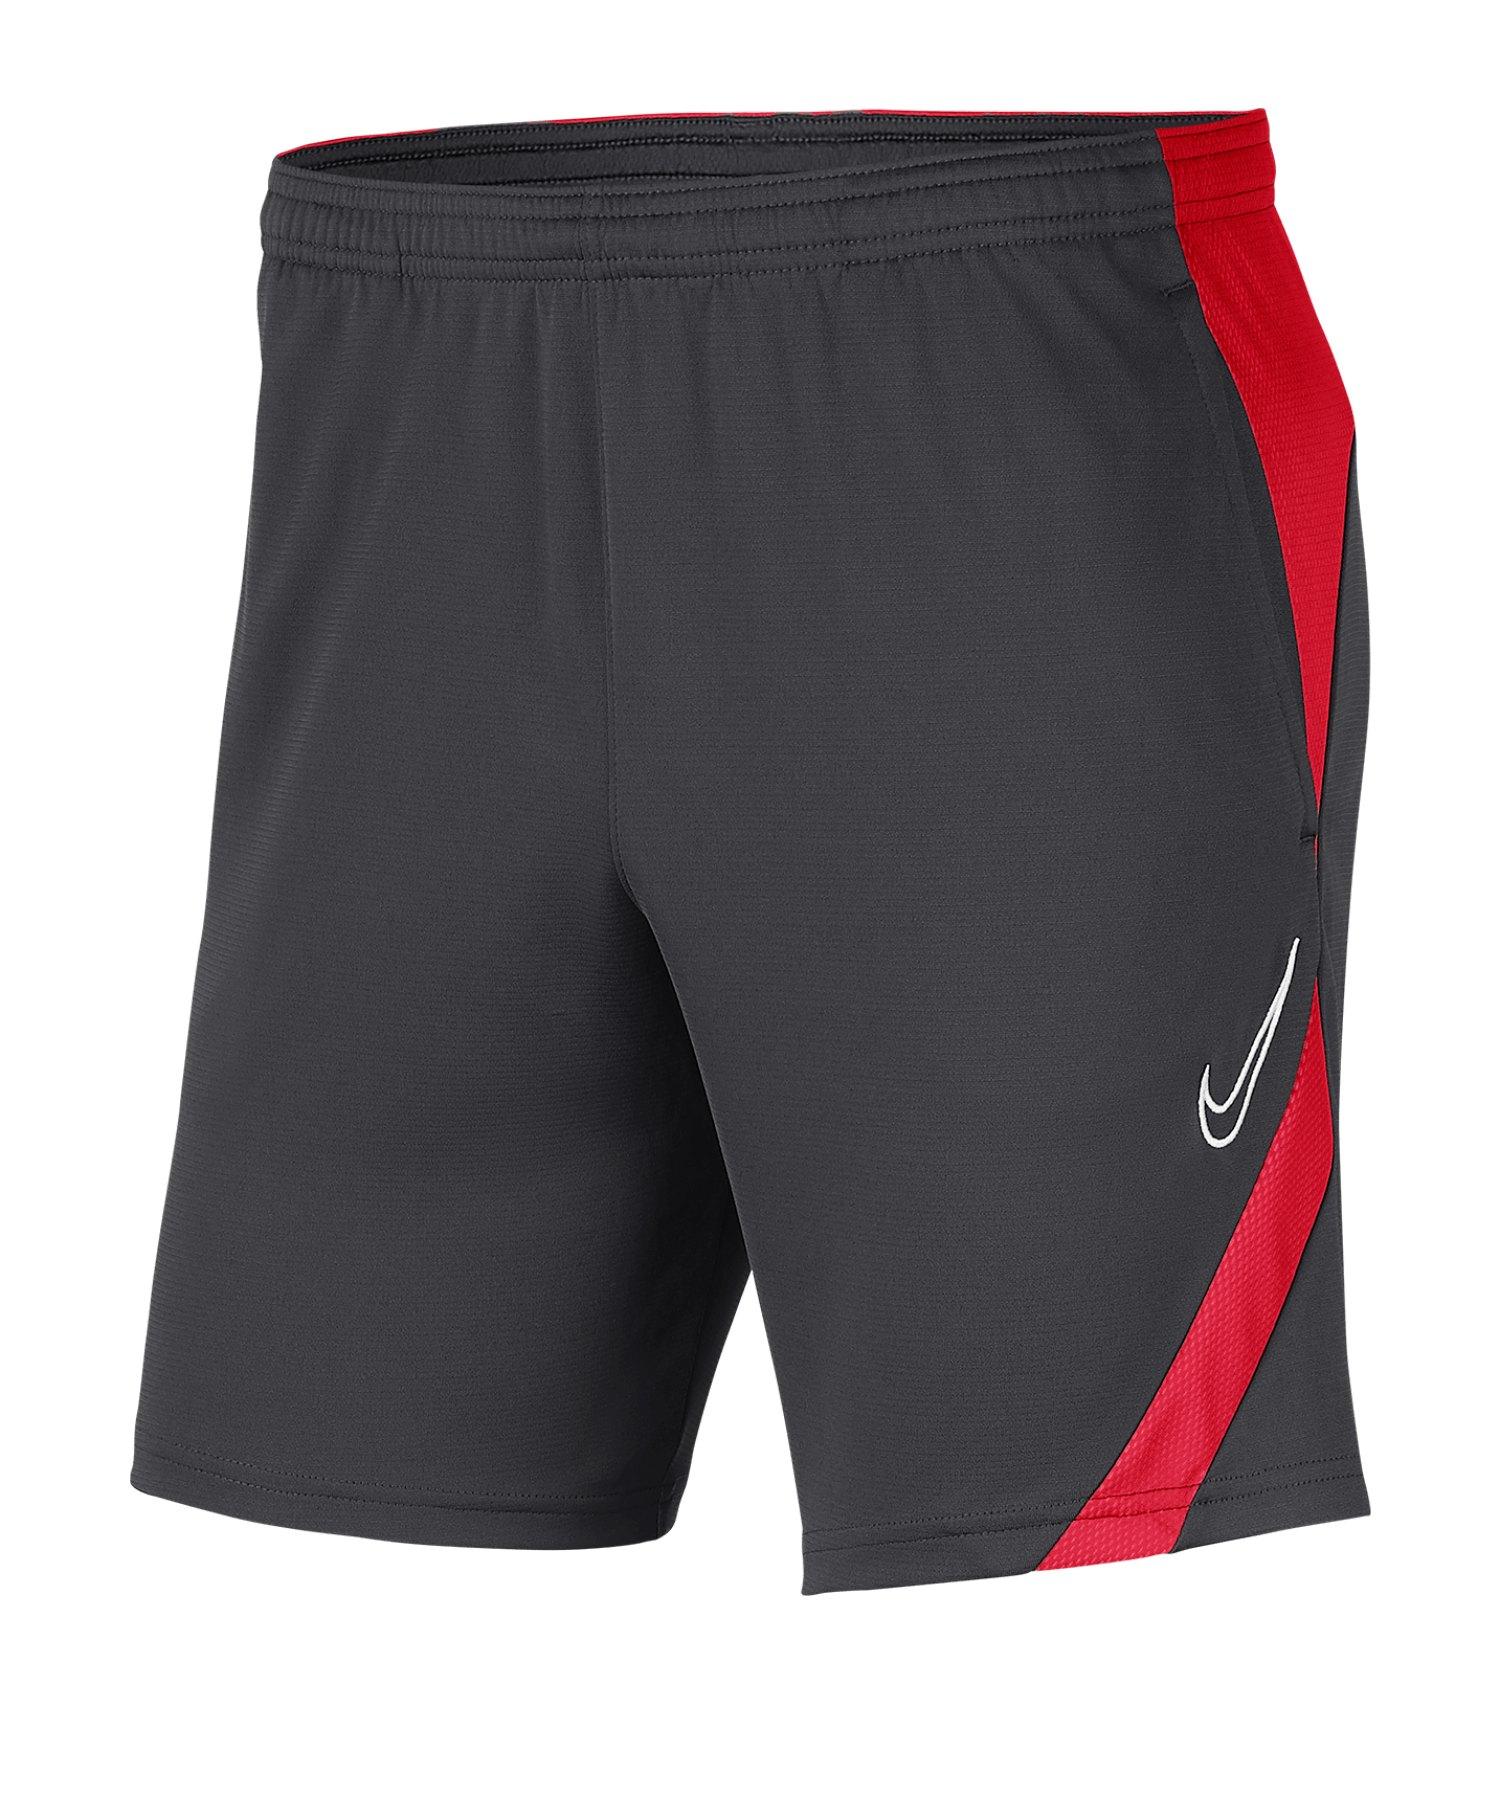 Nike Academy Pro Short Grau F062 - grau